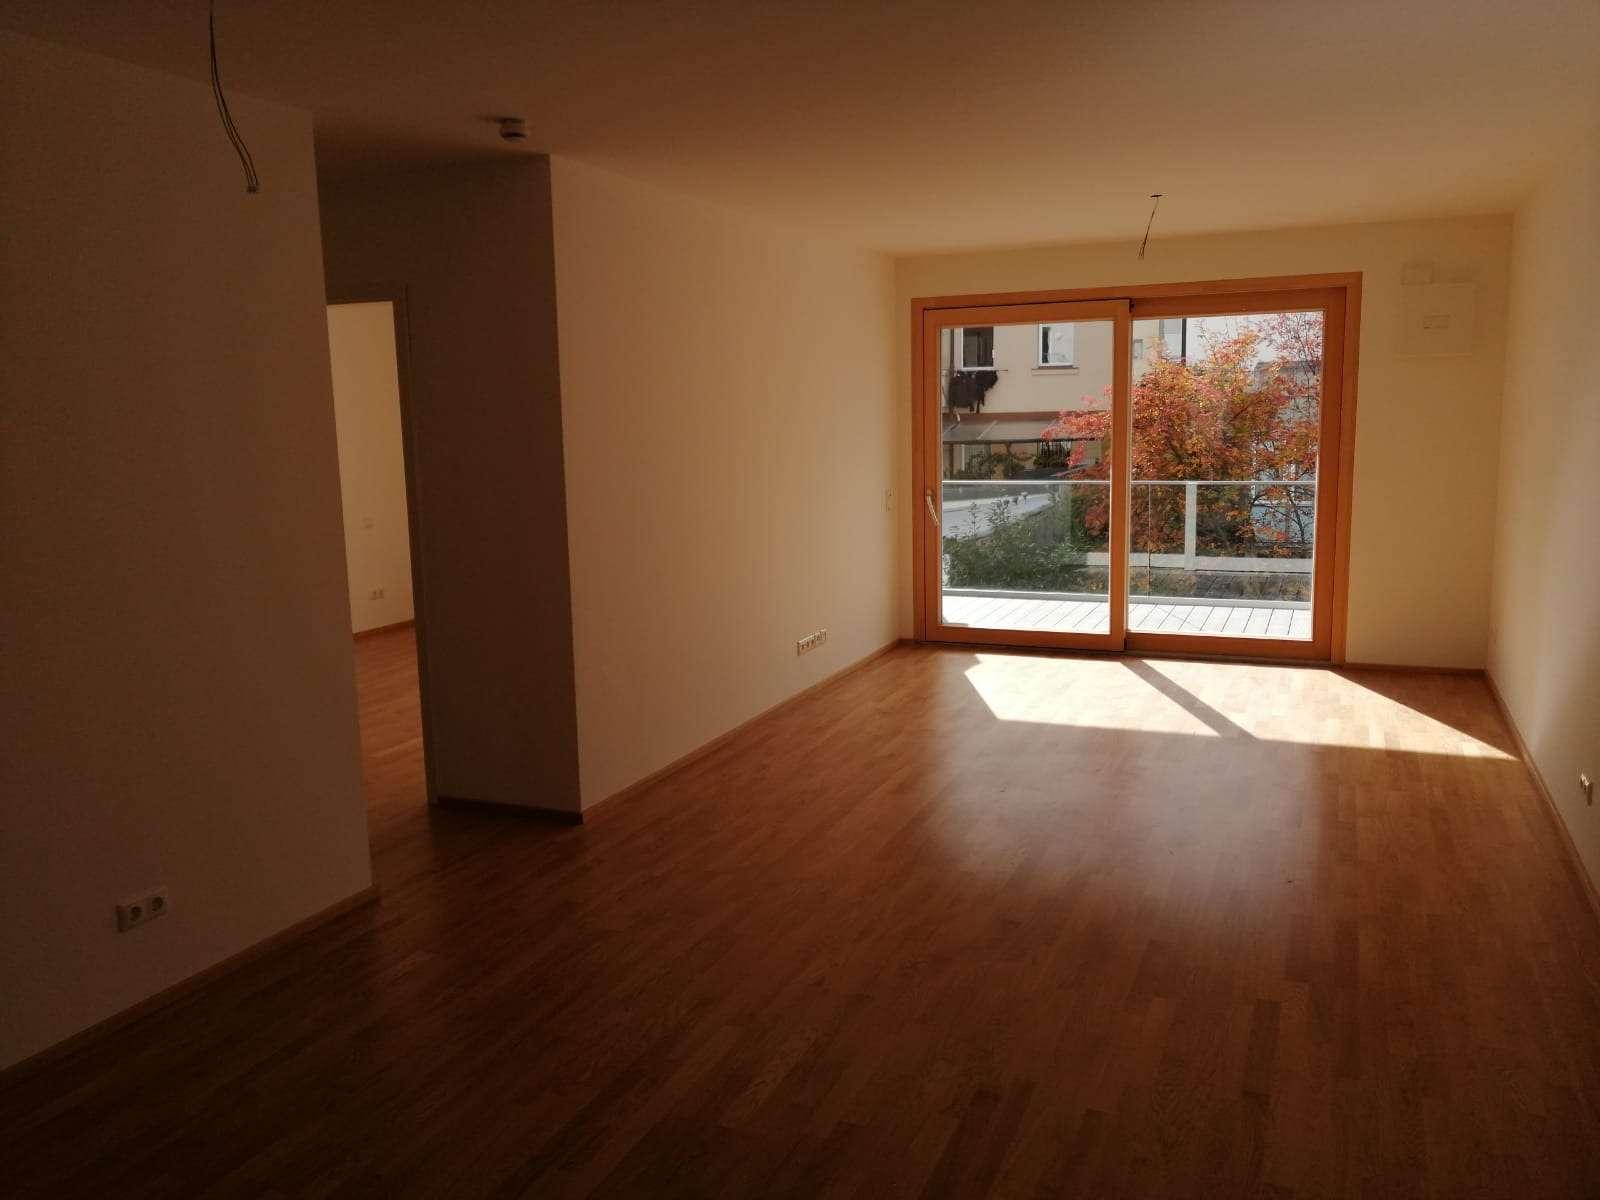 TOP-Wohnung mitten im Bamberger Zentrum - ERSTBEZUG in Insel (Bamberg)